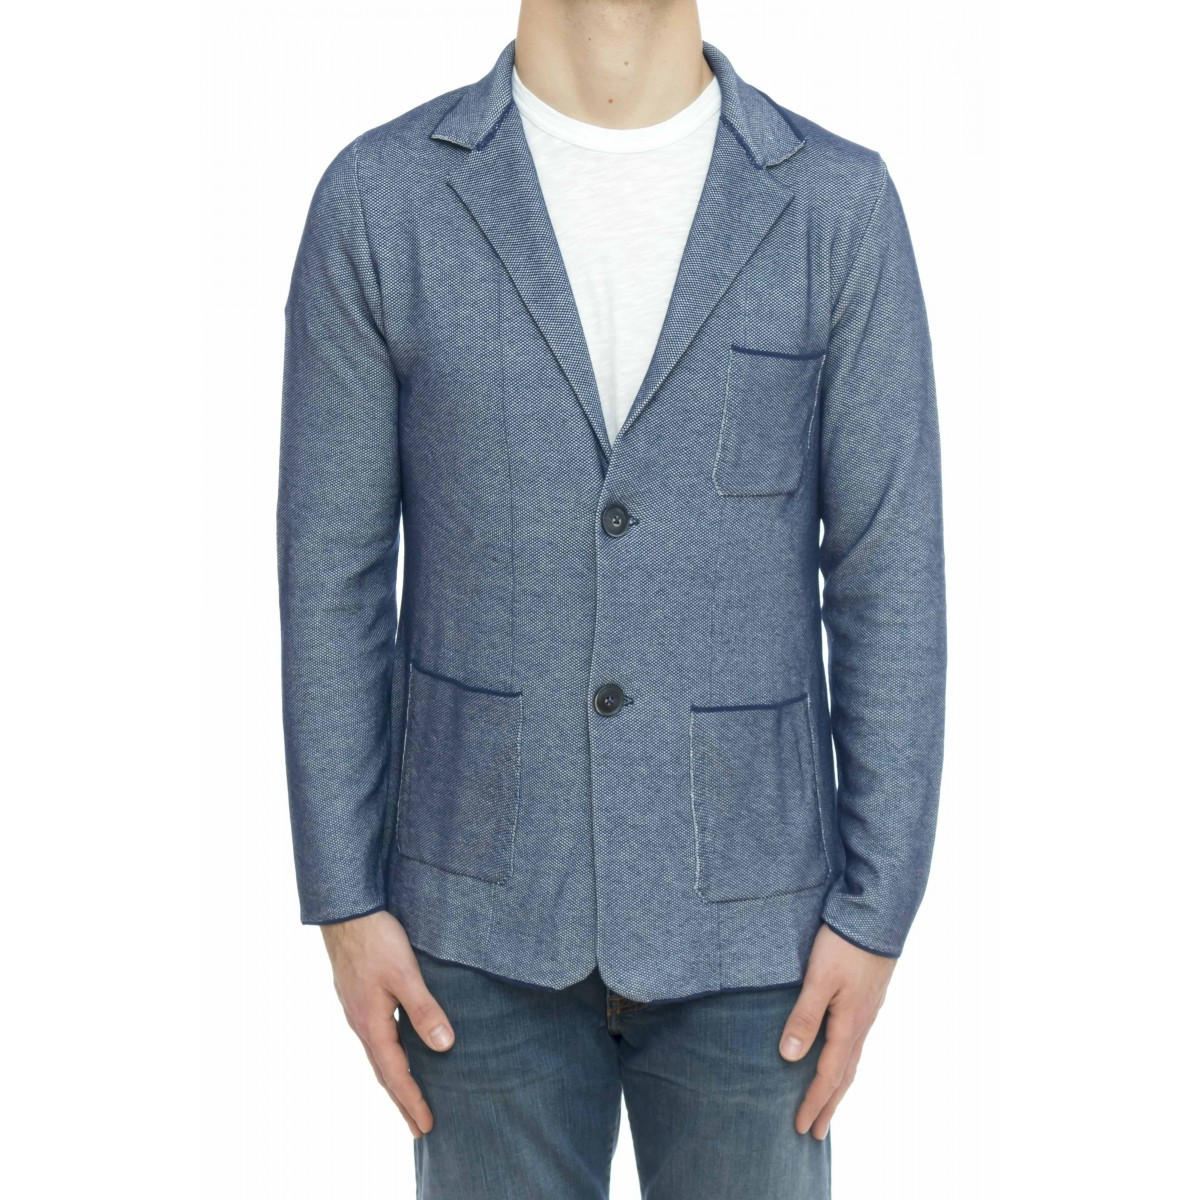 Giacca uomo - 3025 giacca cotone viscosa